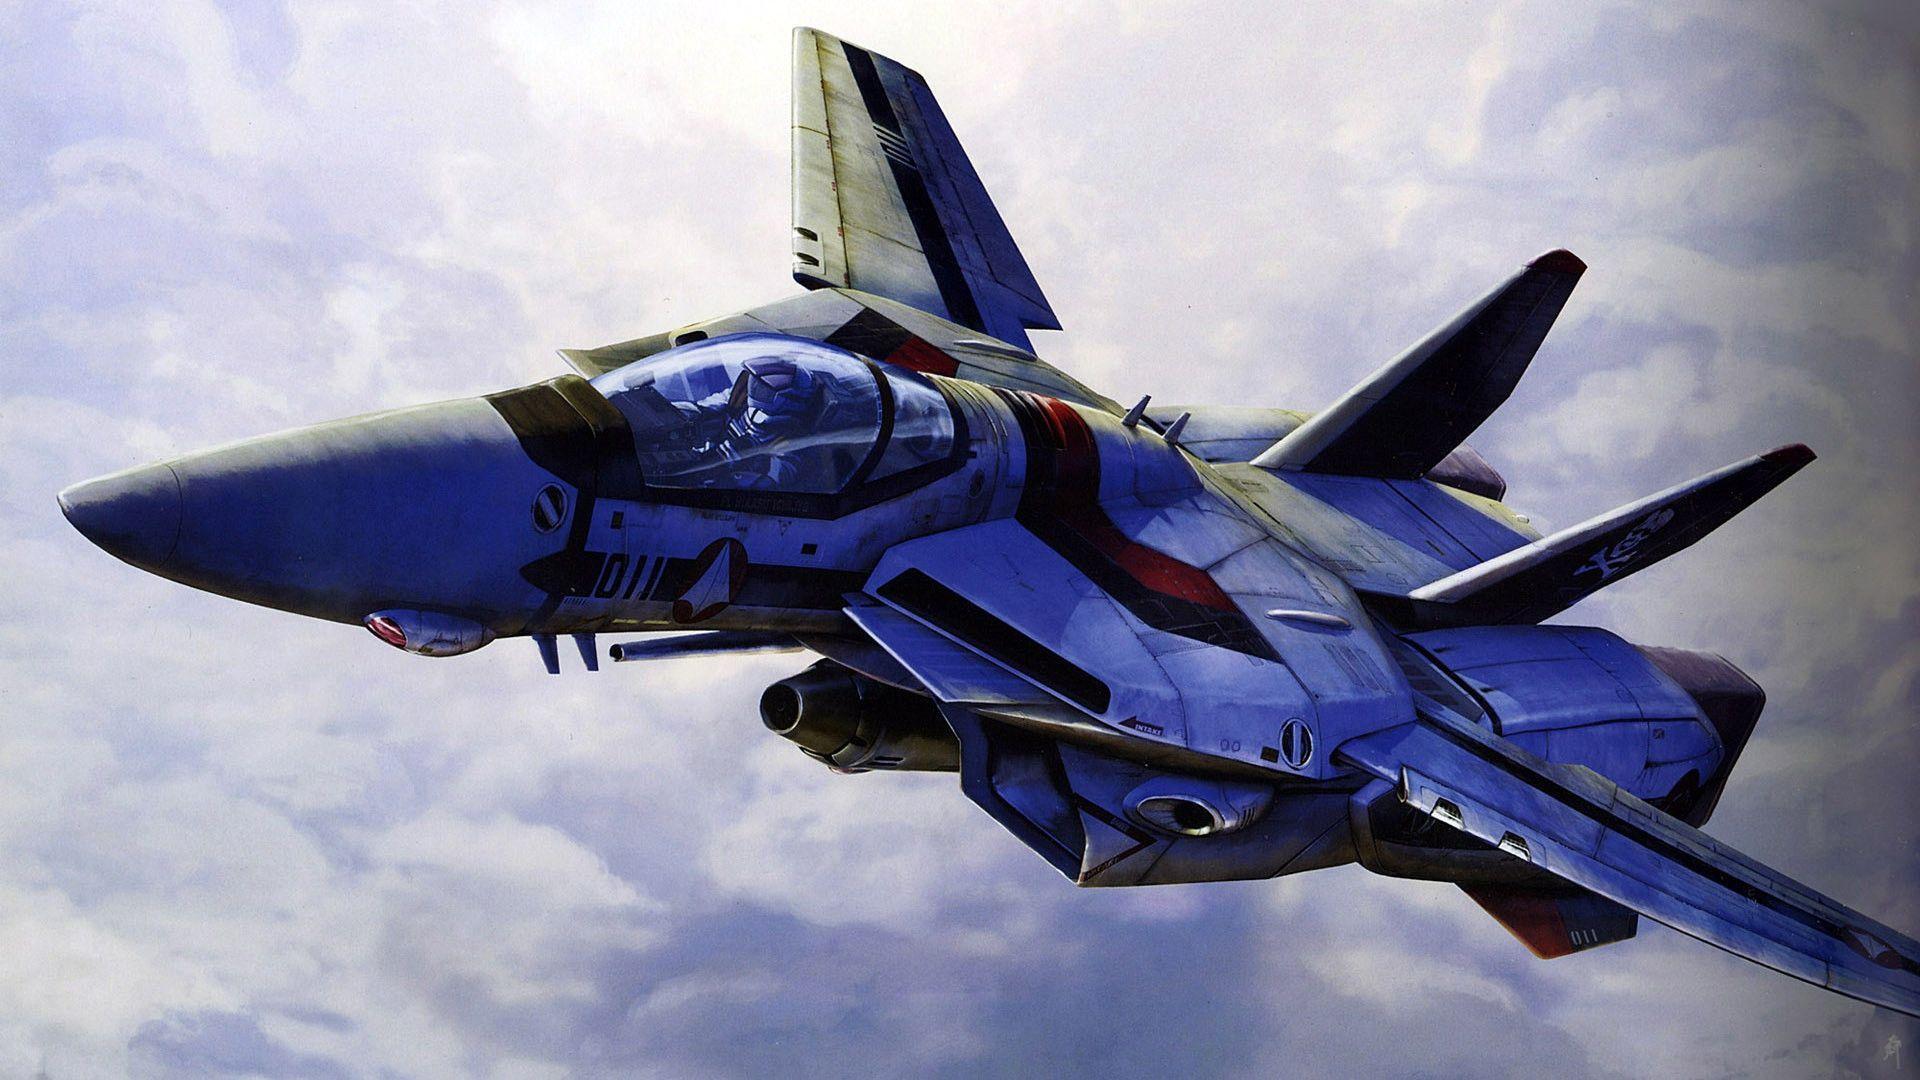 aeroplane wallpapers in hdaeroplane - photo #31